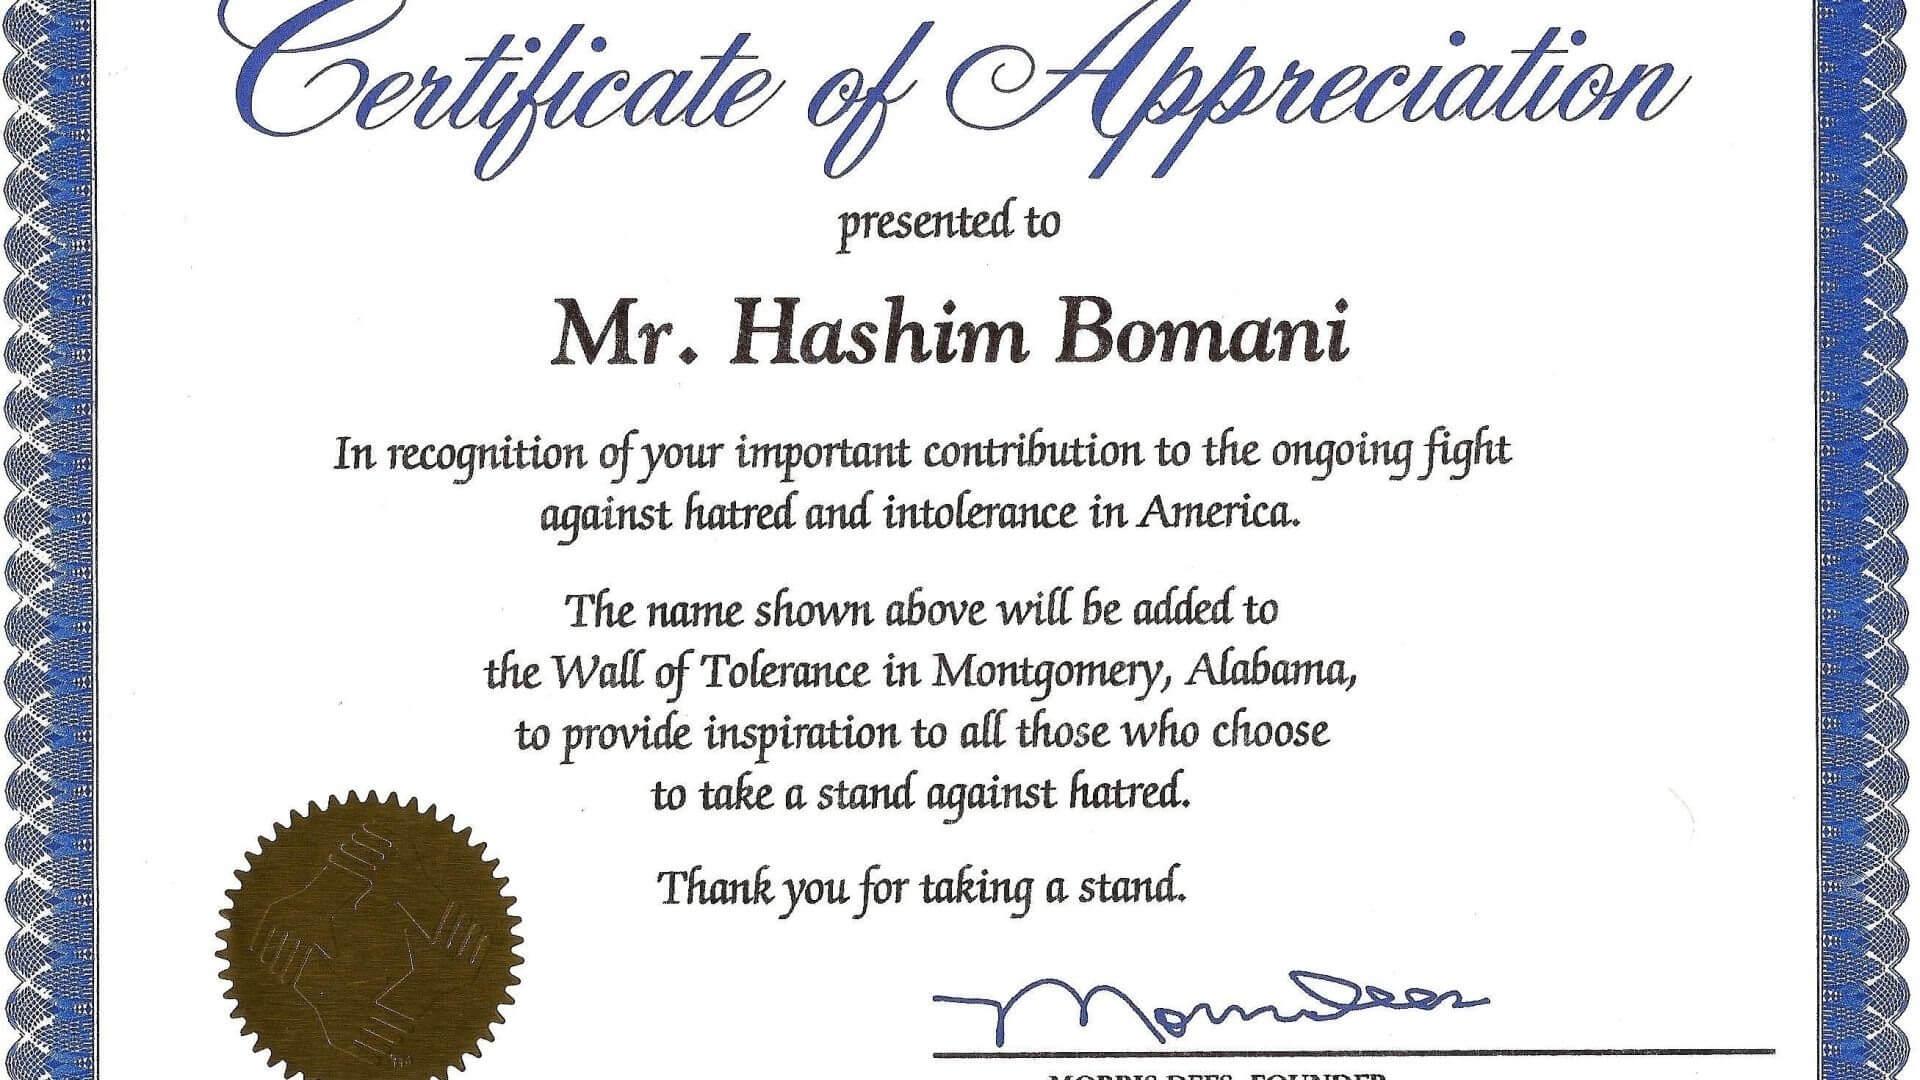 Certificate Of Appreciation Verbiage - Dalep.midnightpig.co Inside Army Certificate Of Appreciation Template